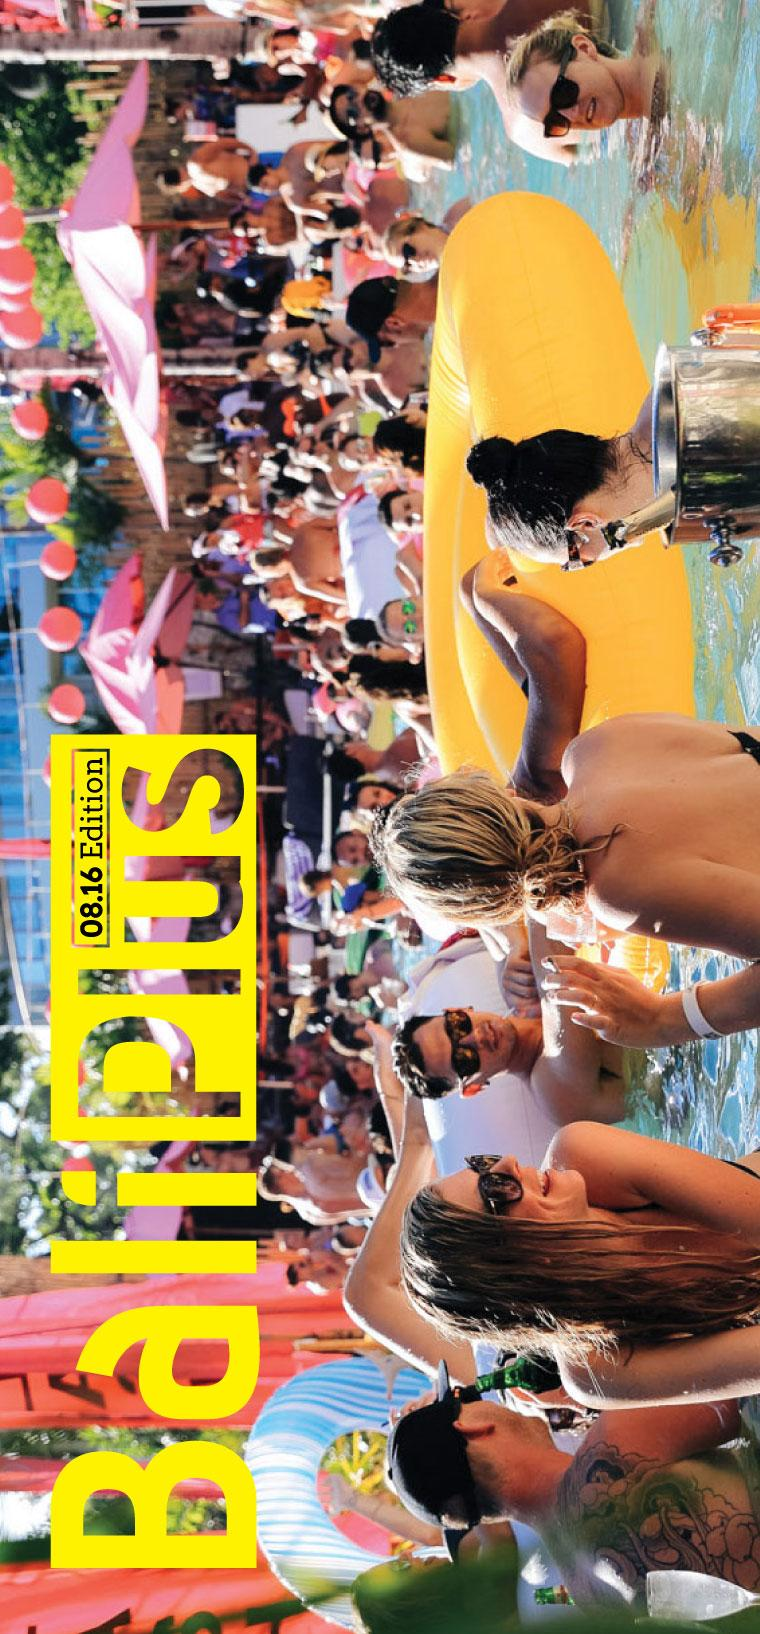 BALI PLUS Digital Magazine August 2016